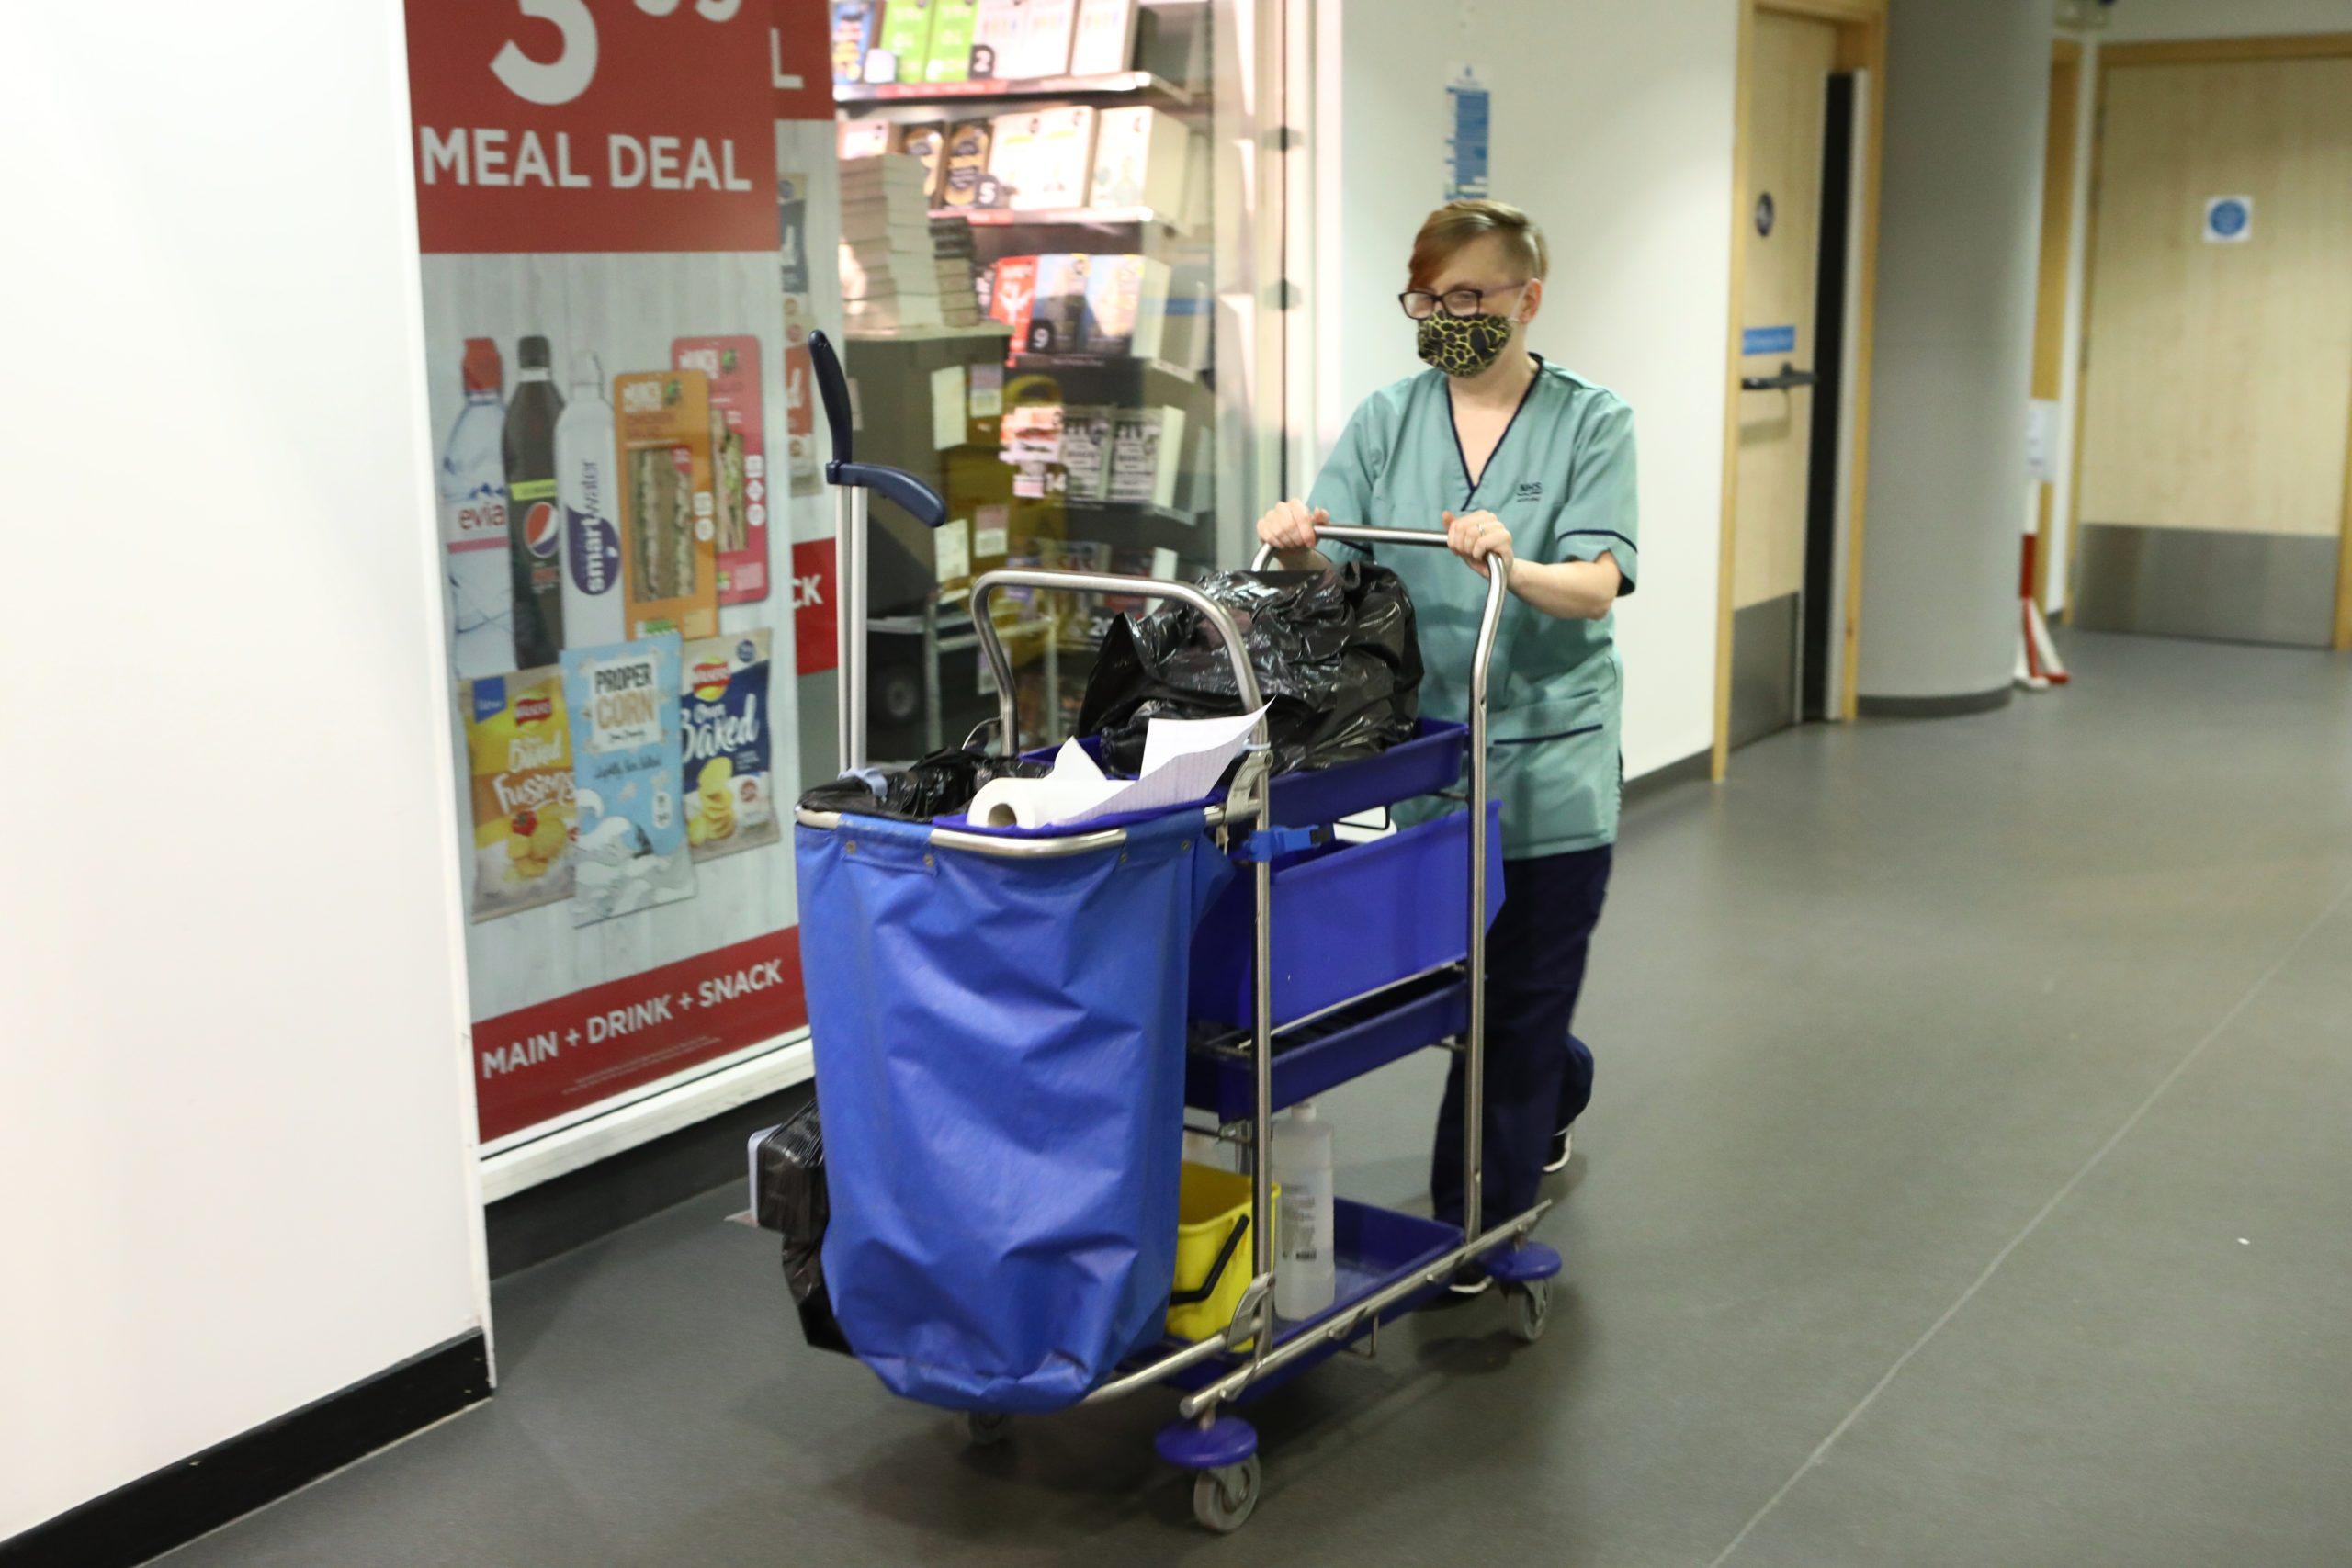 Katie Irwin, a domestic assistant at Ninewells Hospital